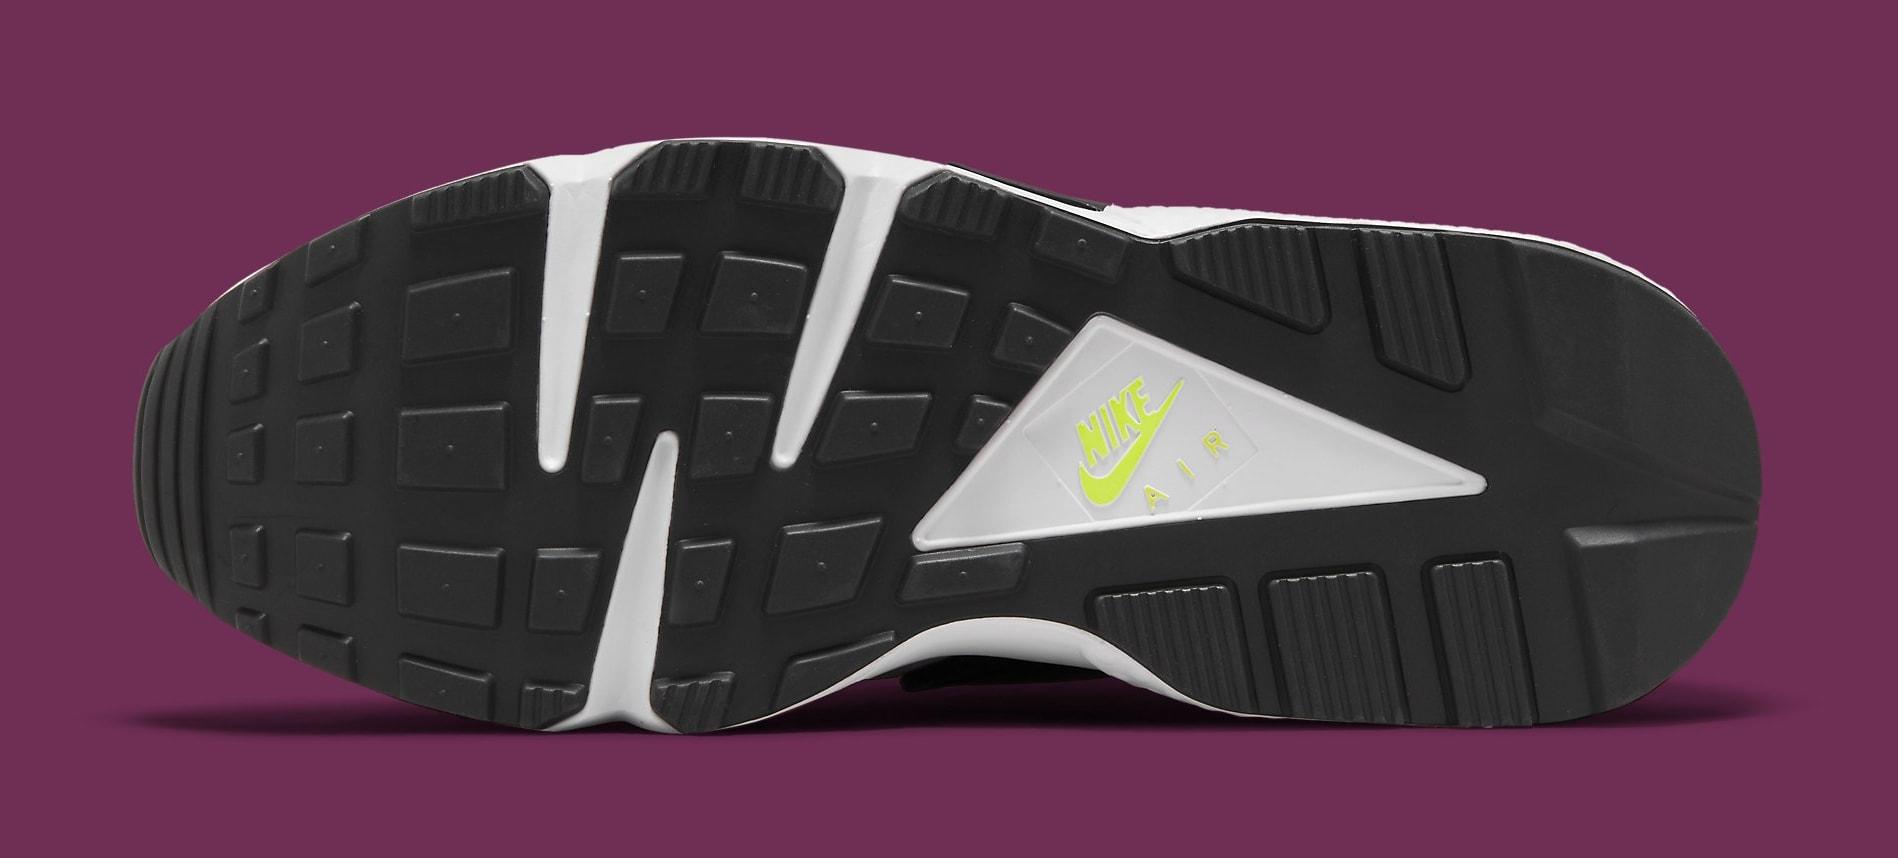 Nike Air Huarache Neon Yellow/Magenta DD1068-104 Outsole